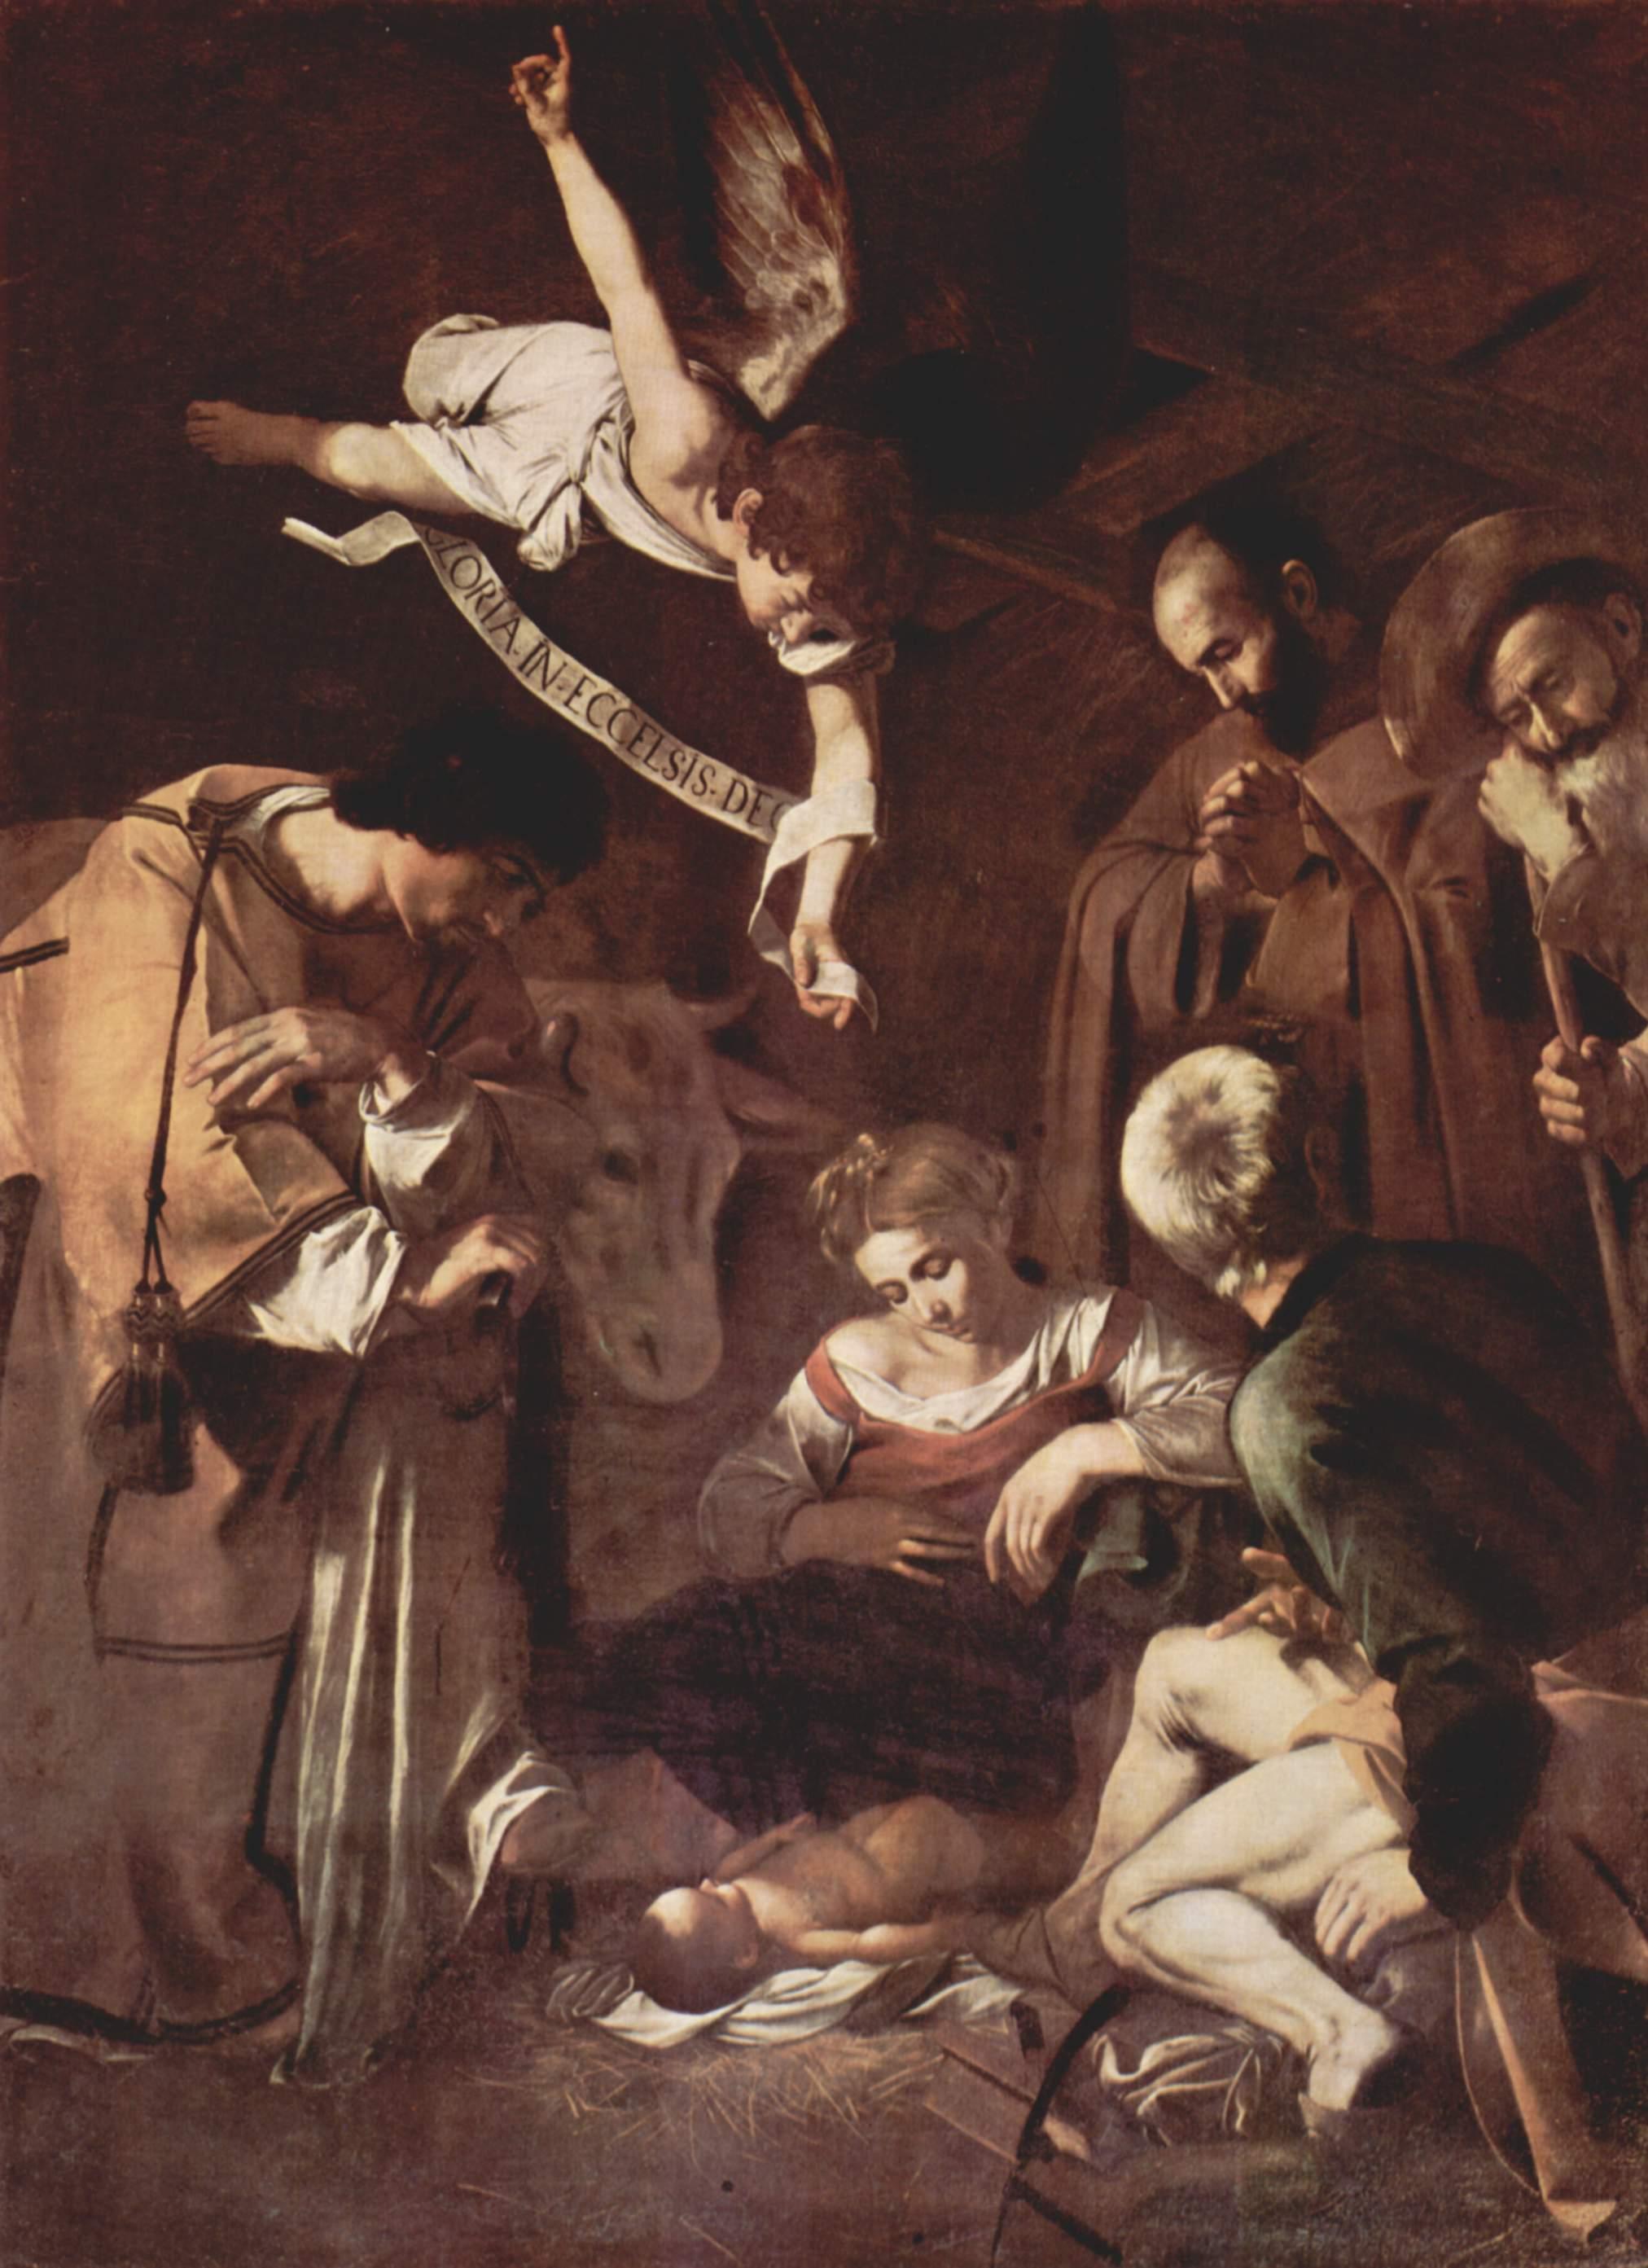 Рождество со св. Лаврентием и св. Франциском, Микеланджело Меризи де Караваджо